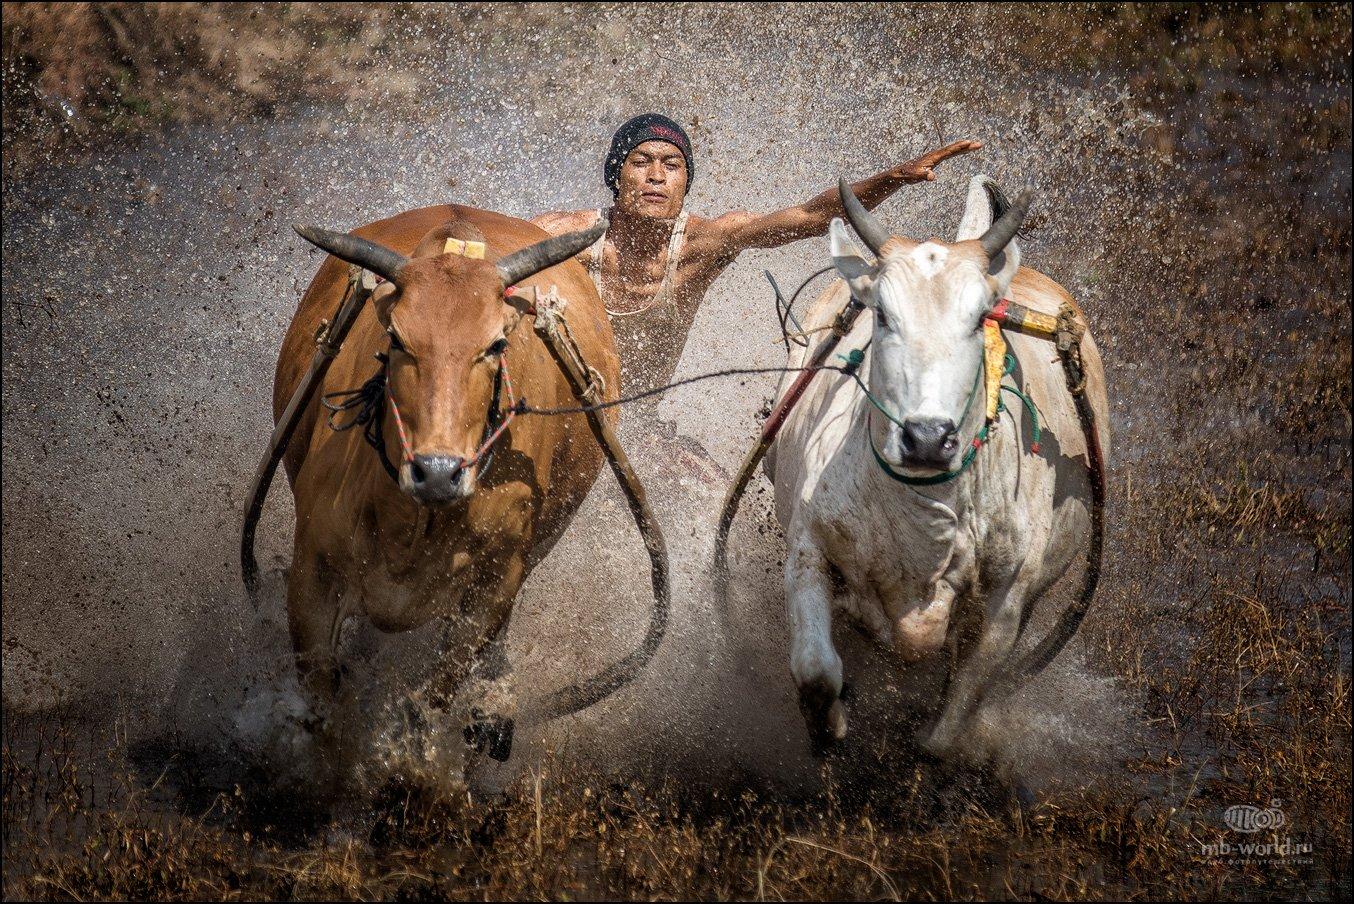 Индонезия, Суматра, путешествия, фототур, Михаил Воробьев